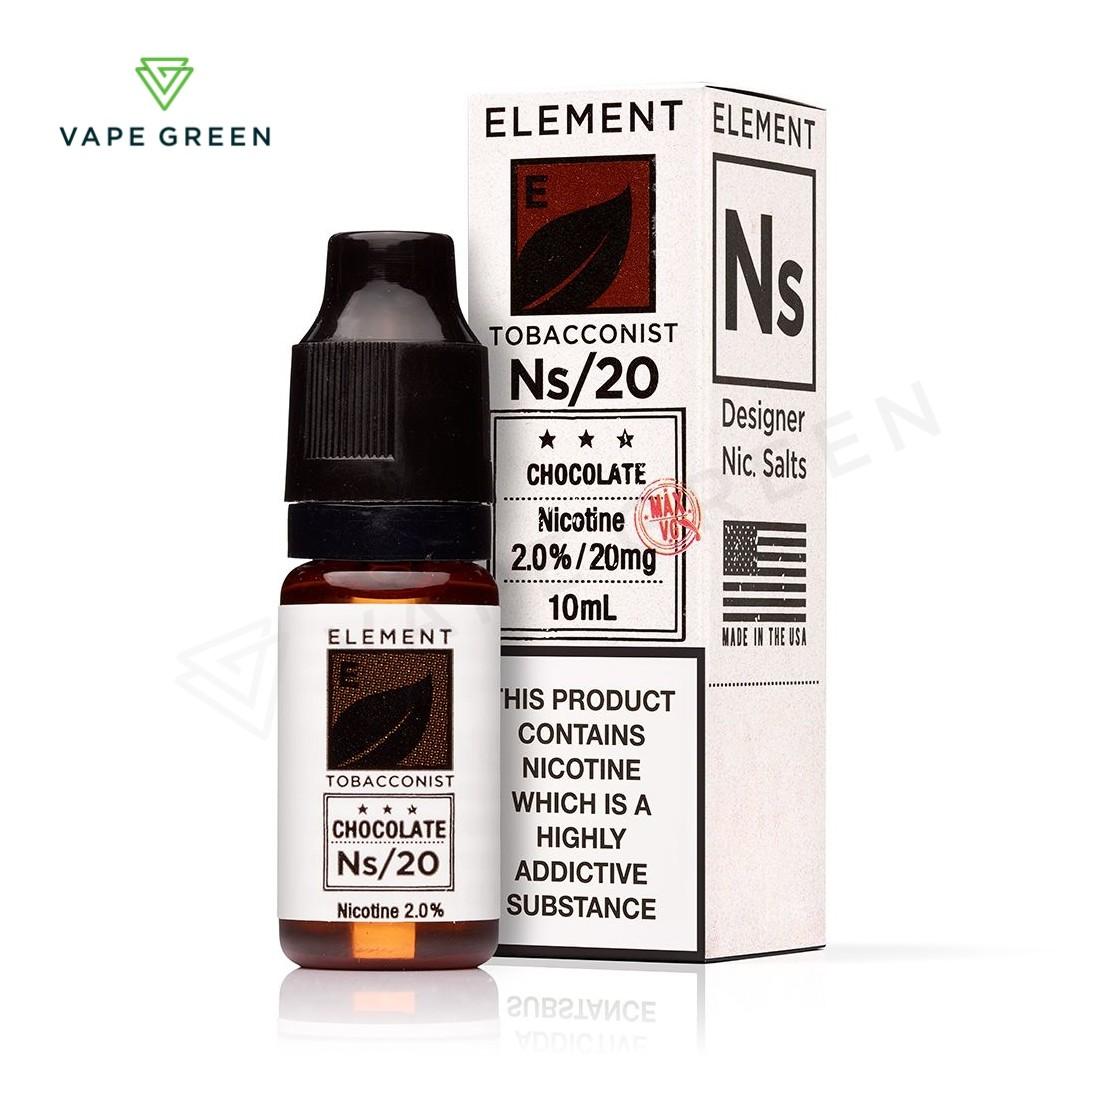 Chocolate Tobacco E-liquid by Element NS10 & NS20